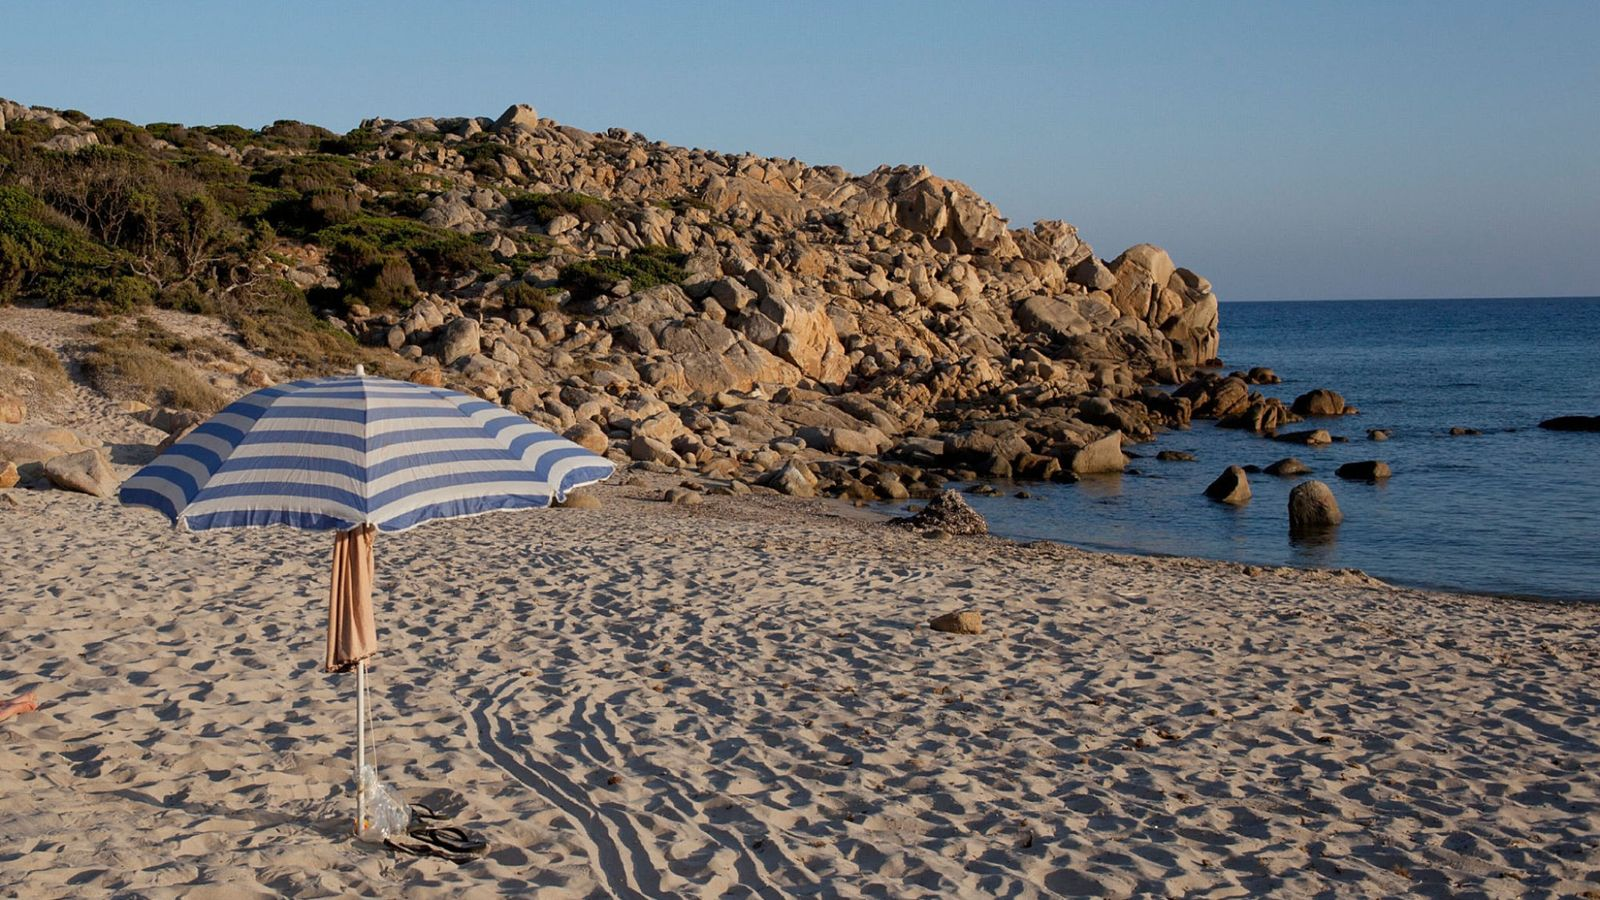 Tourists who took sand from Sardinian beach face jail